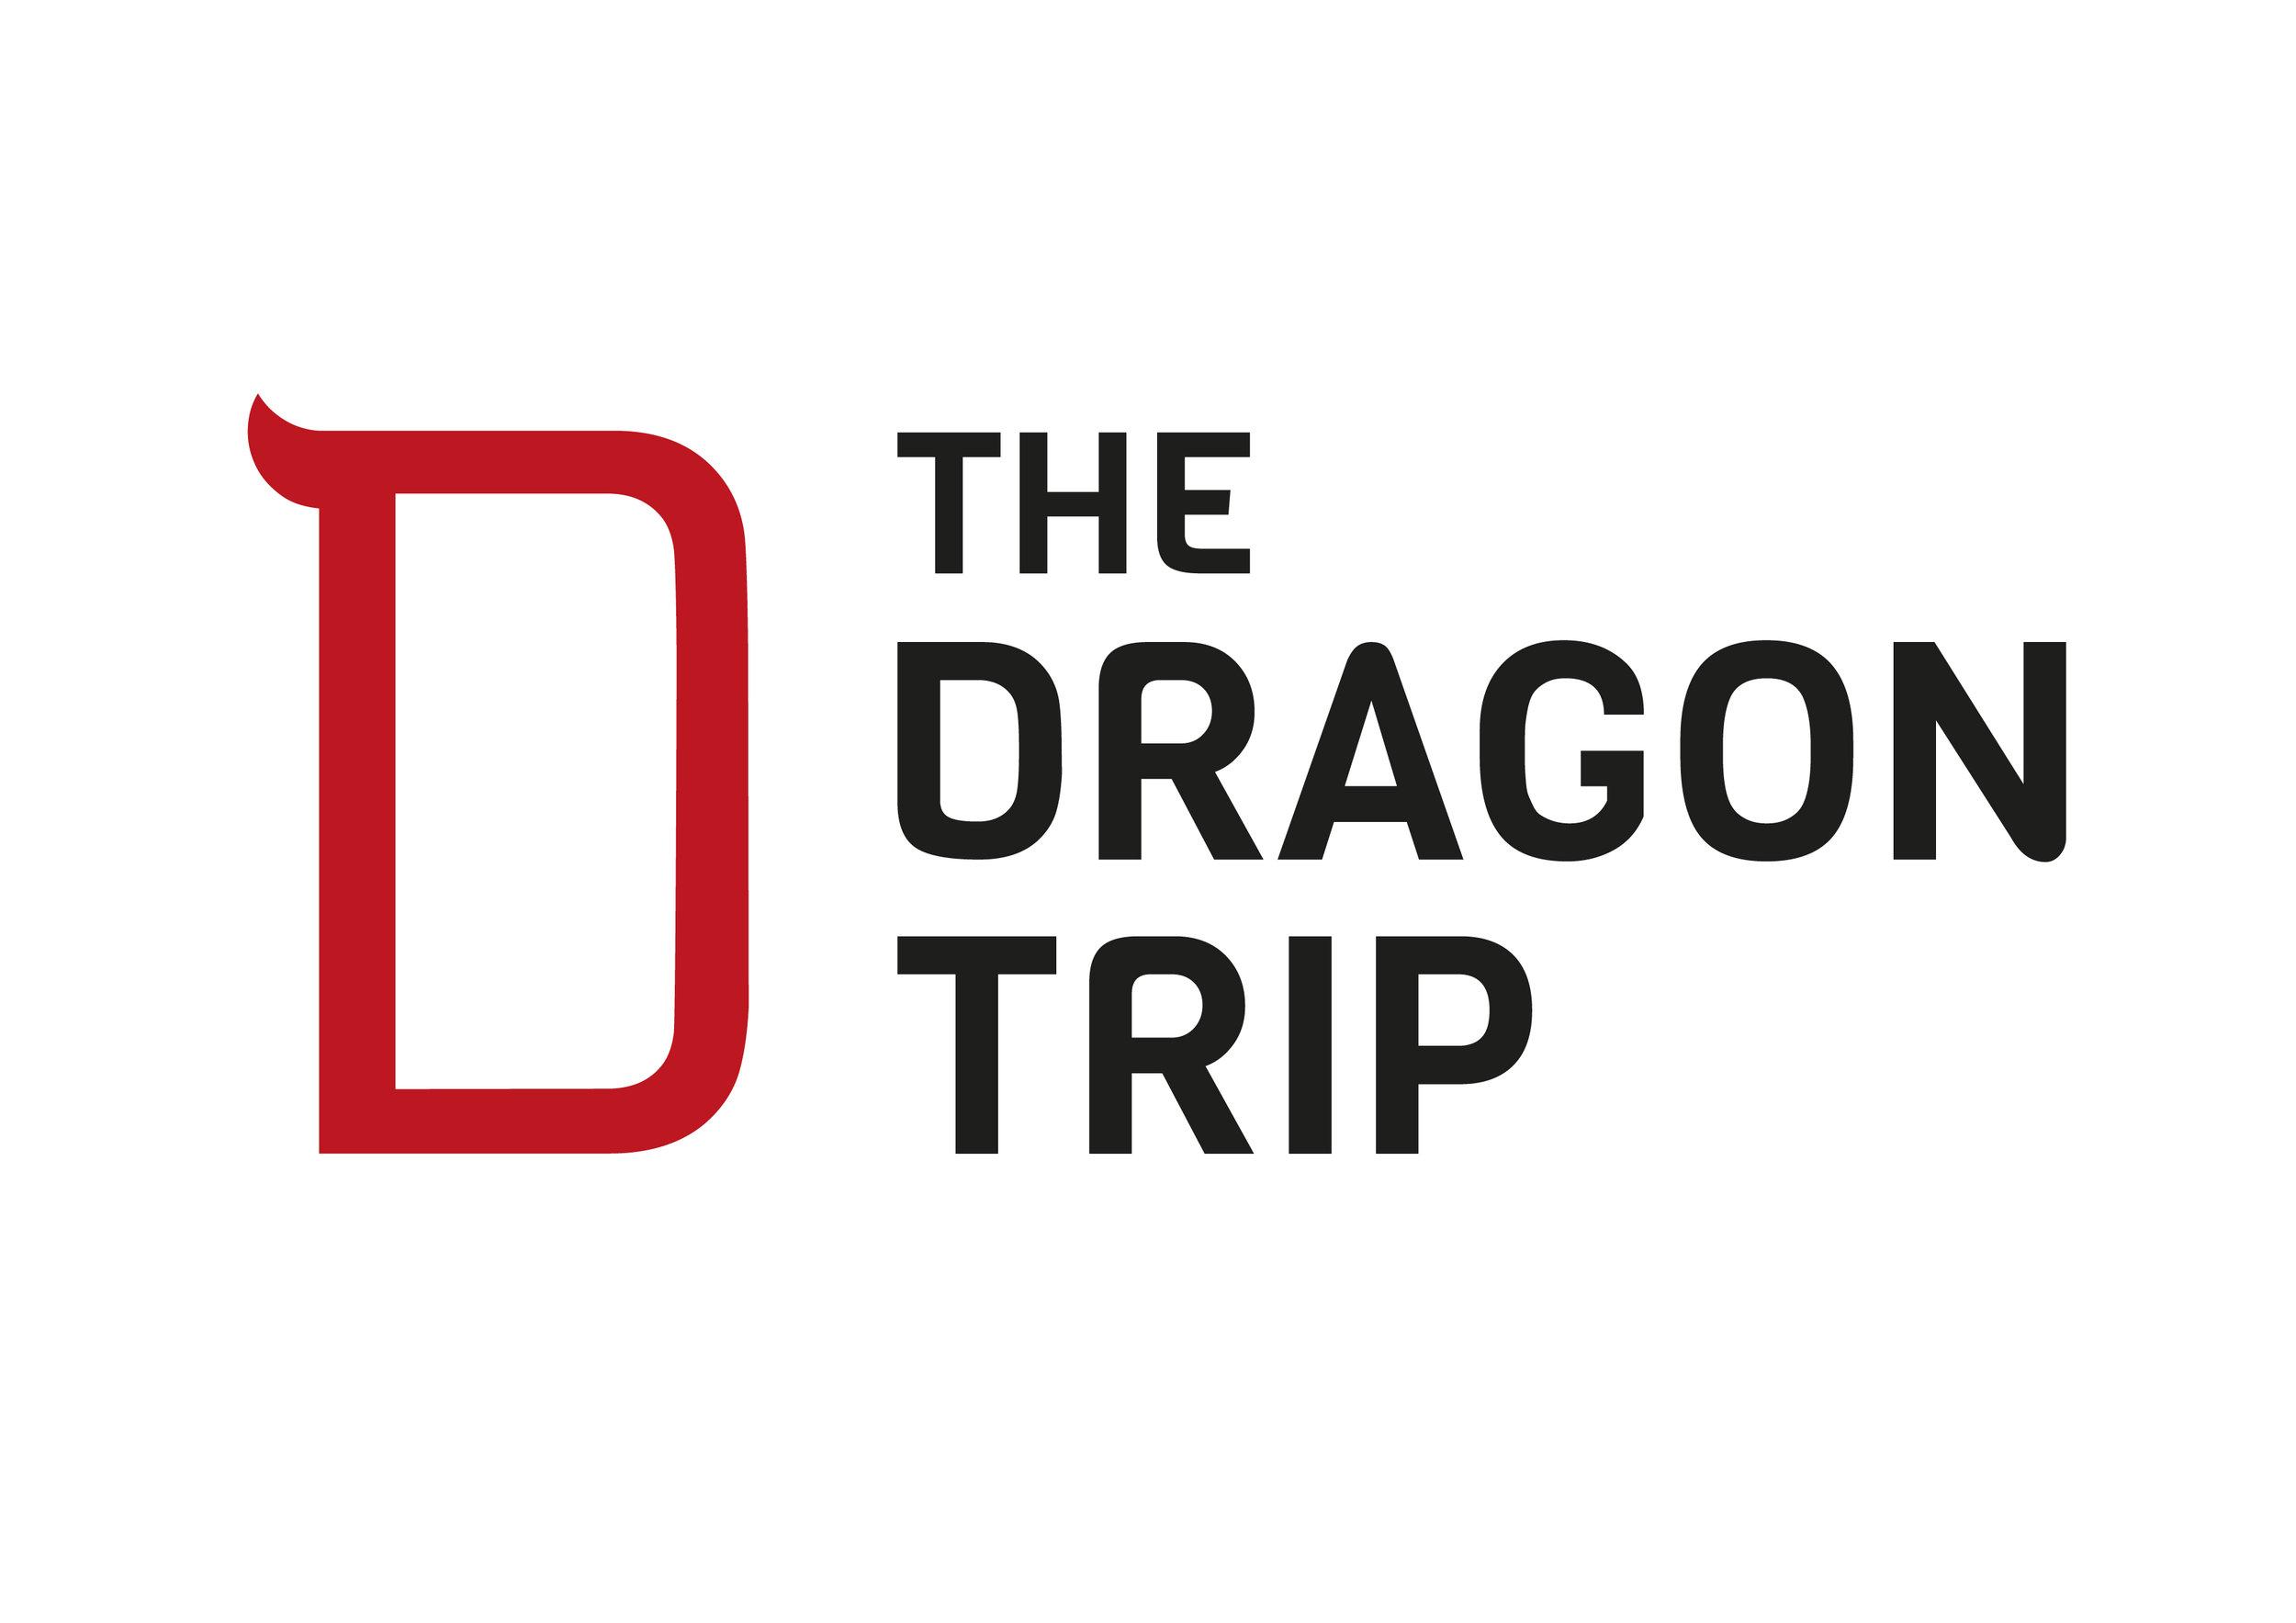 The_Dragon_Trip-997f.png